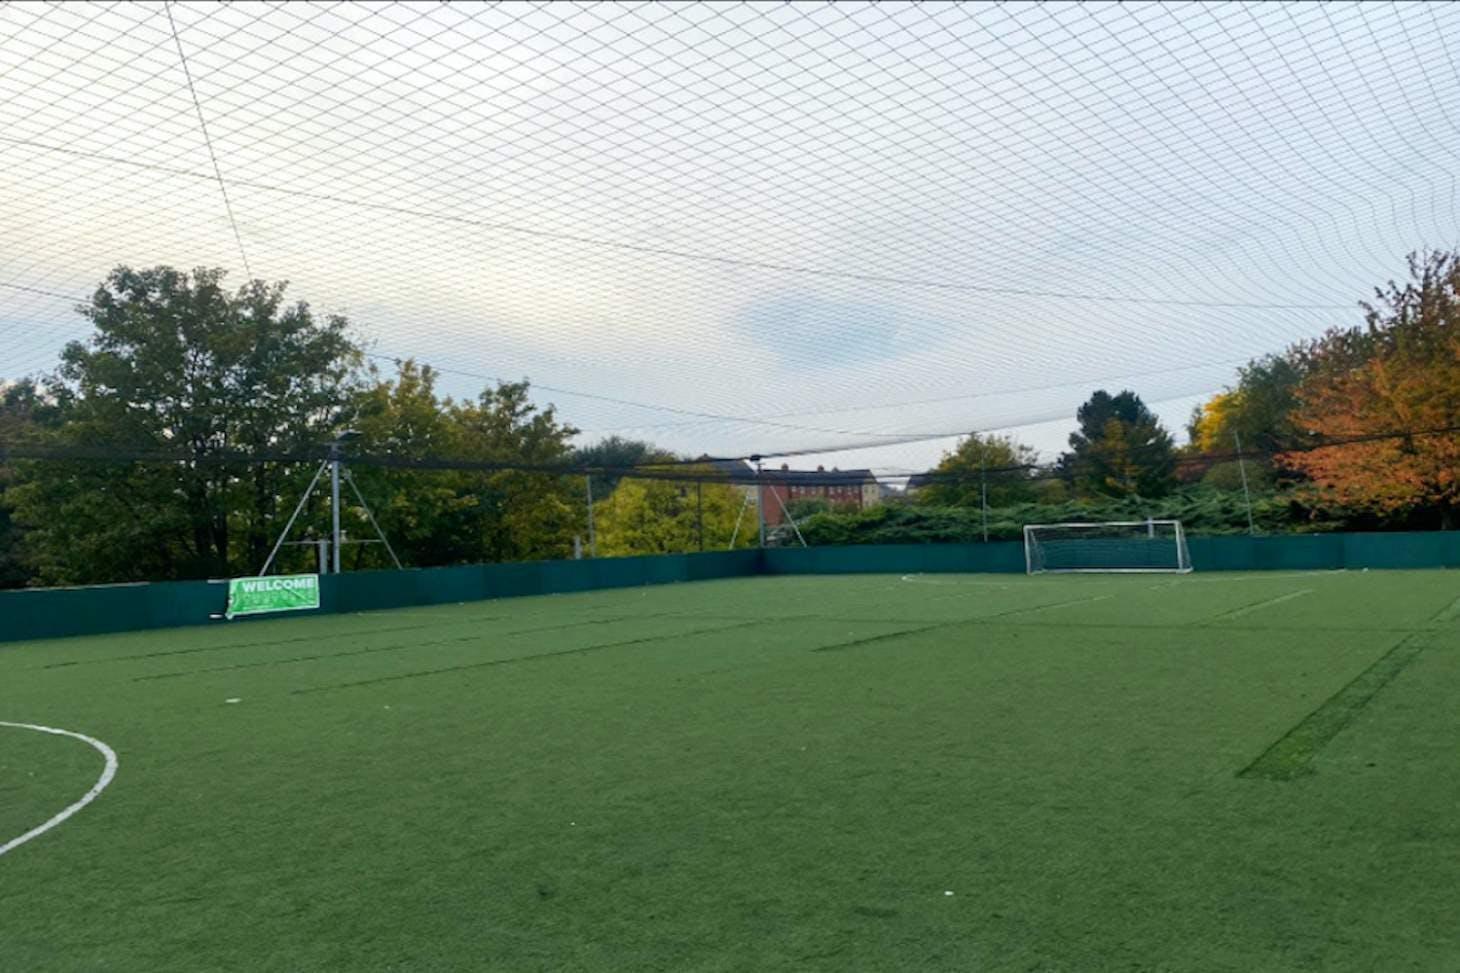 Powerleague Leeds Central 7 a side   3G Astroturf football pitch